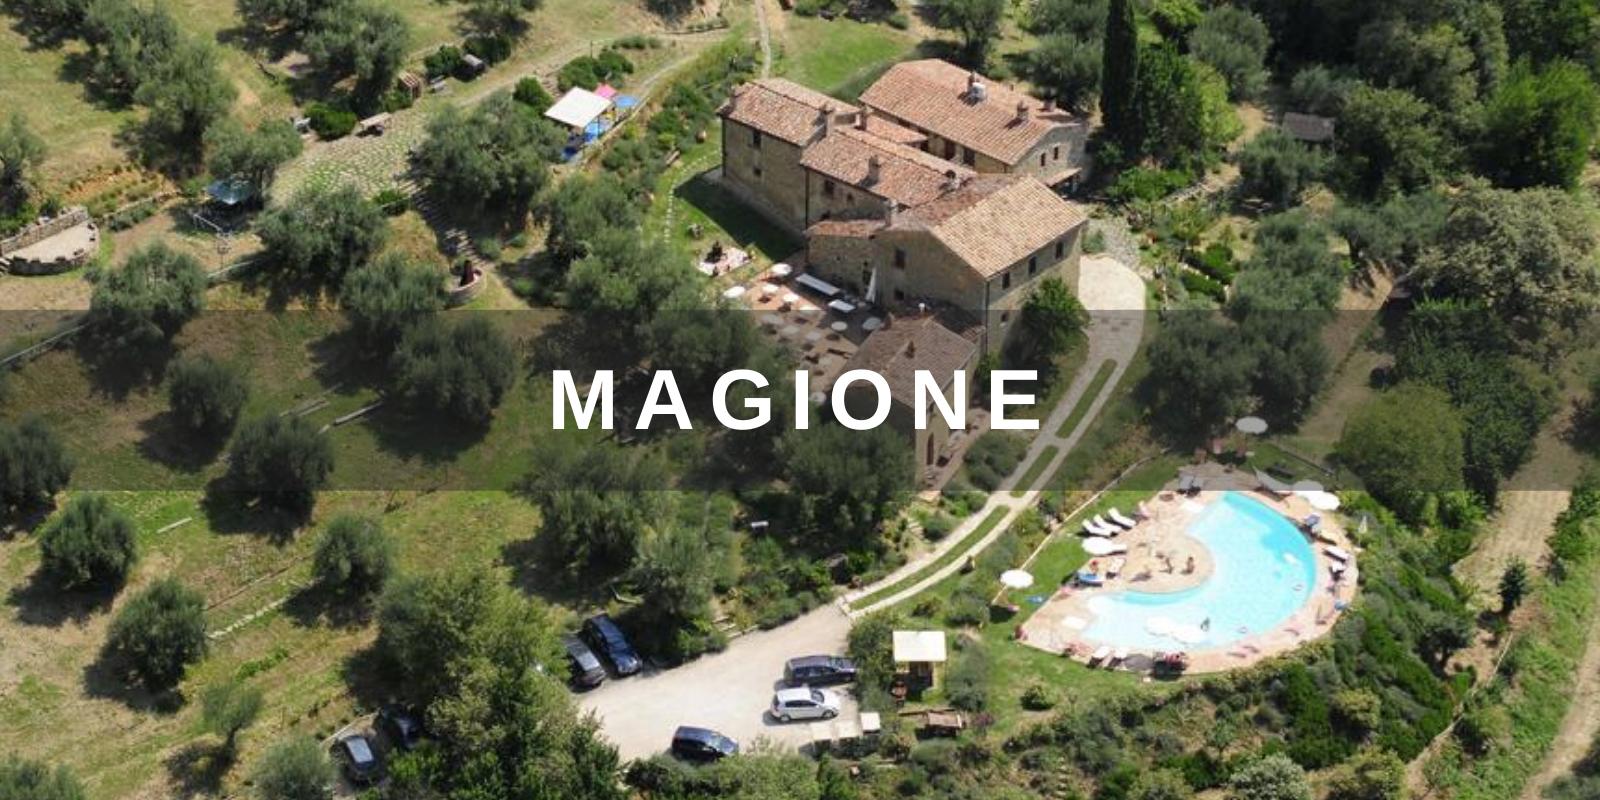 Umbria Montagna - Vacanze per anziani a Magione ...